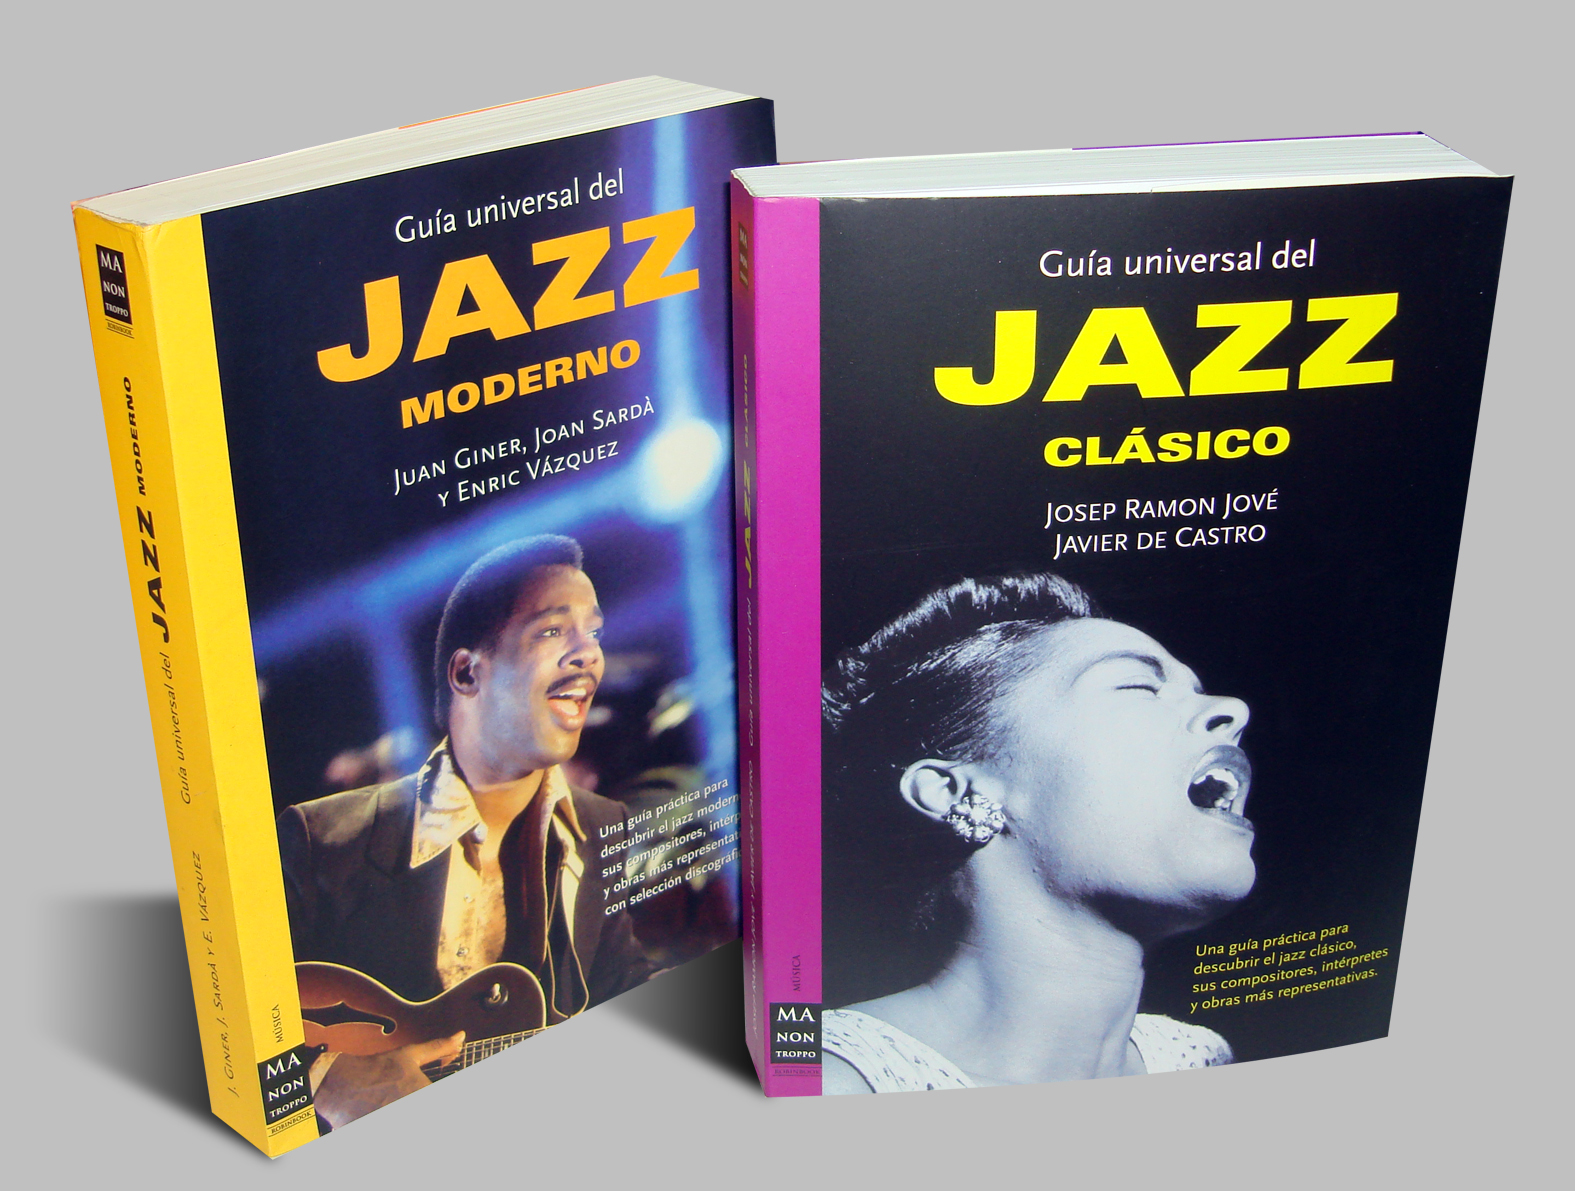 http://argentjazz.com.ar/wp-content/uploads/2012/08/Jazz-Clasico-y-moderno.jpg